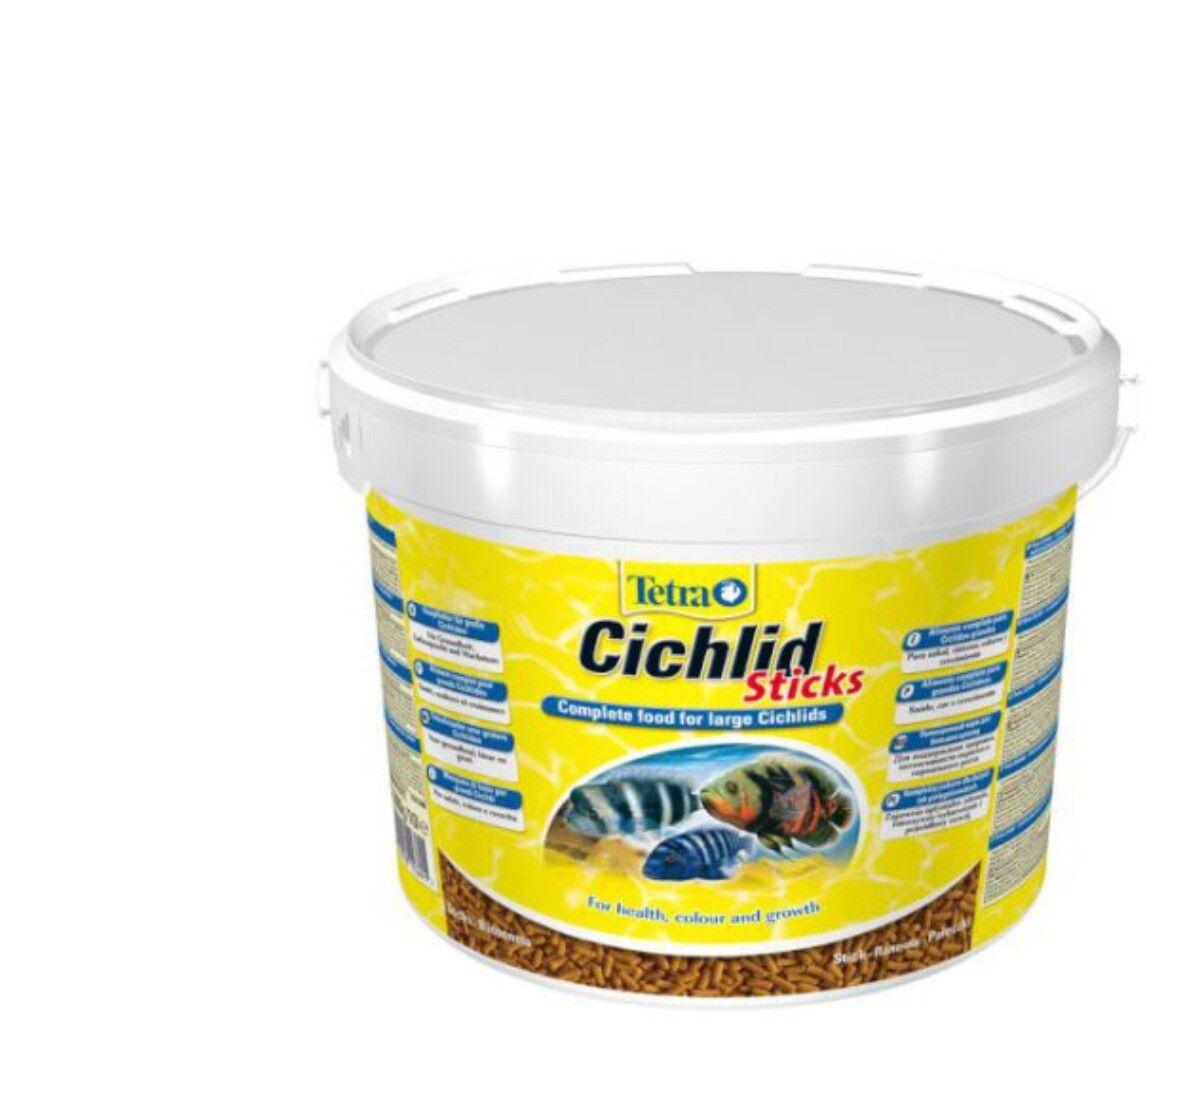 Tetra Cichlid Sticks 10 L. Hauptfutter für alle Cichliden Cichliden Cichliden u.a. große Zierfische e1fdea